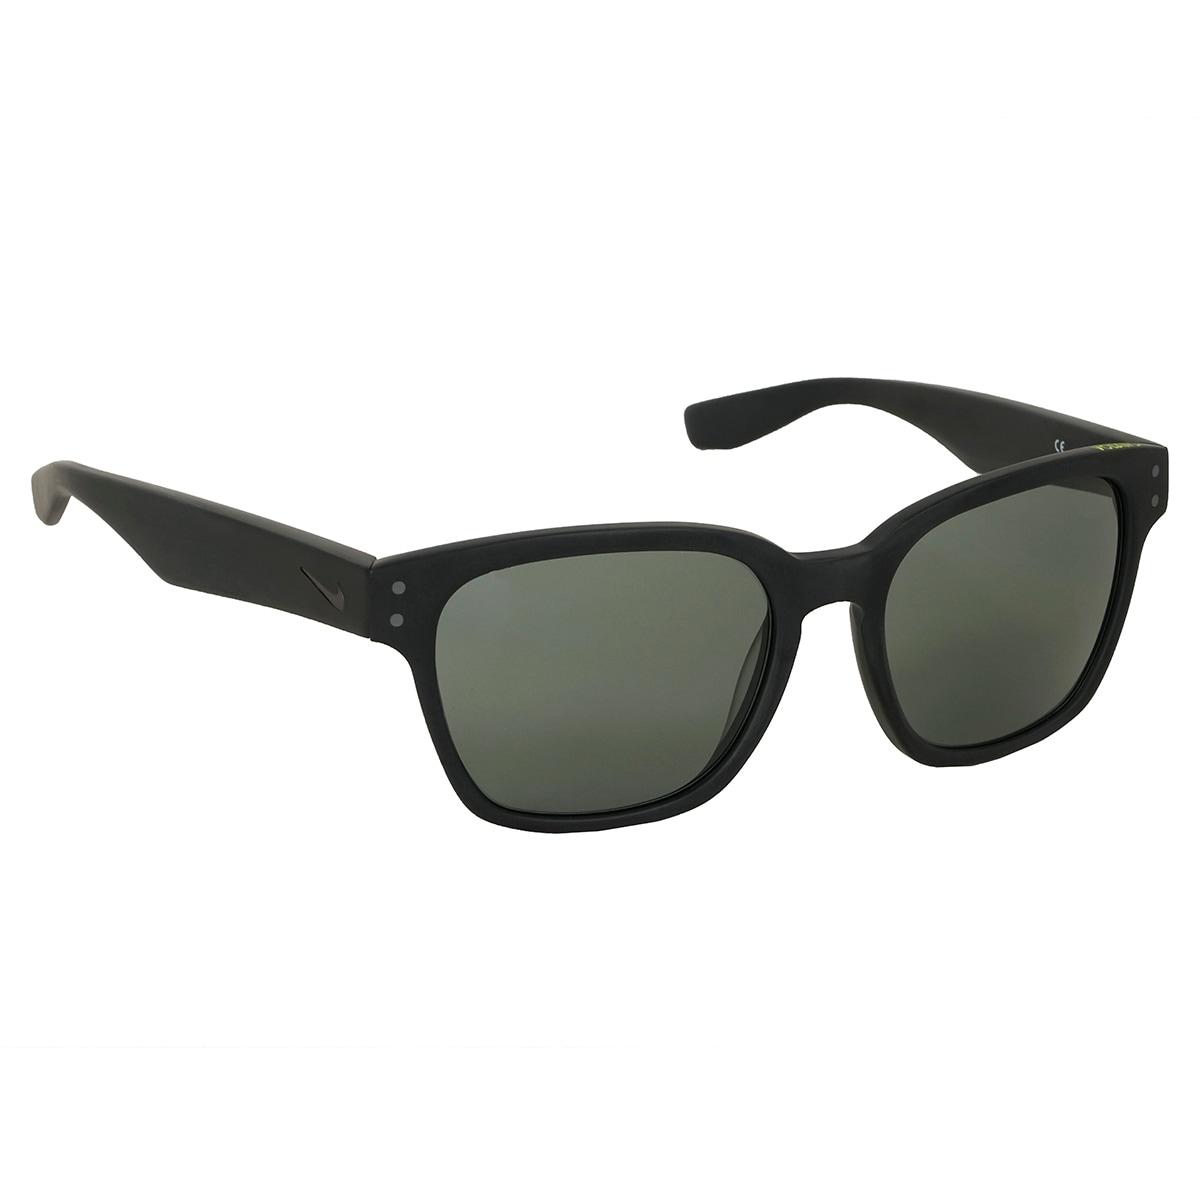 fusión novia patrocinador  Nike Volano EV0877 Sunglasses - Overstock - 24169740